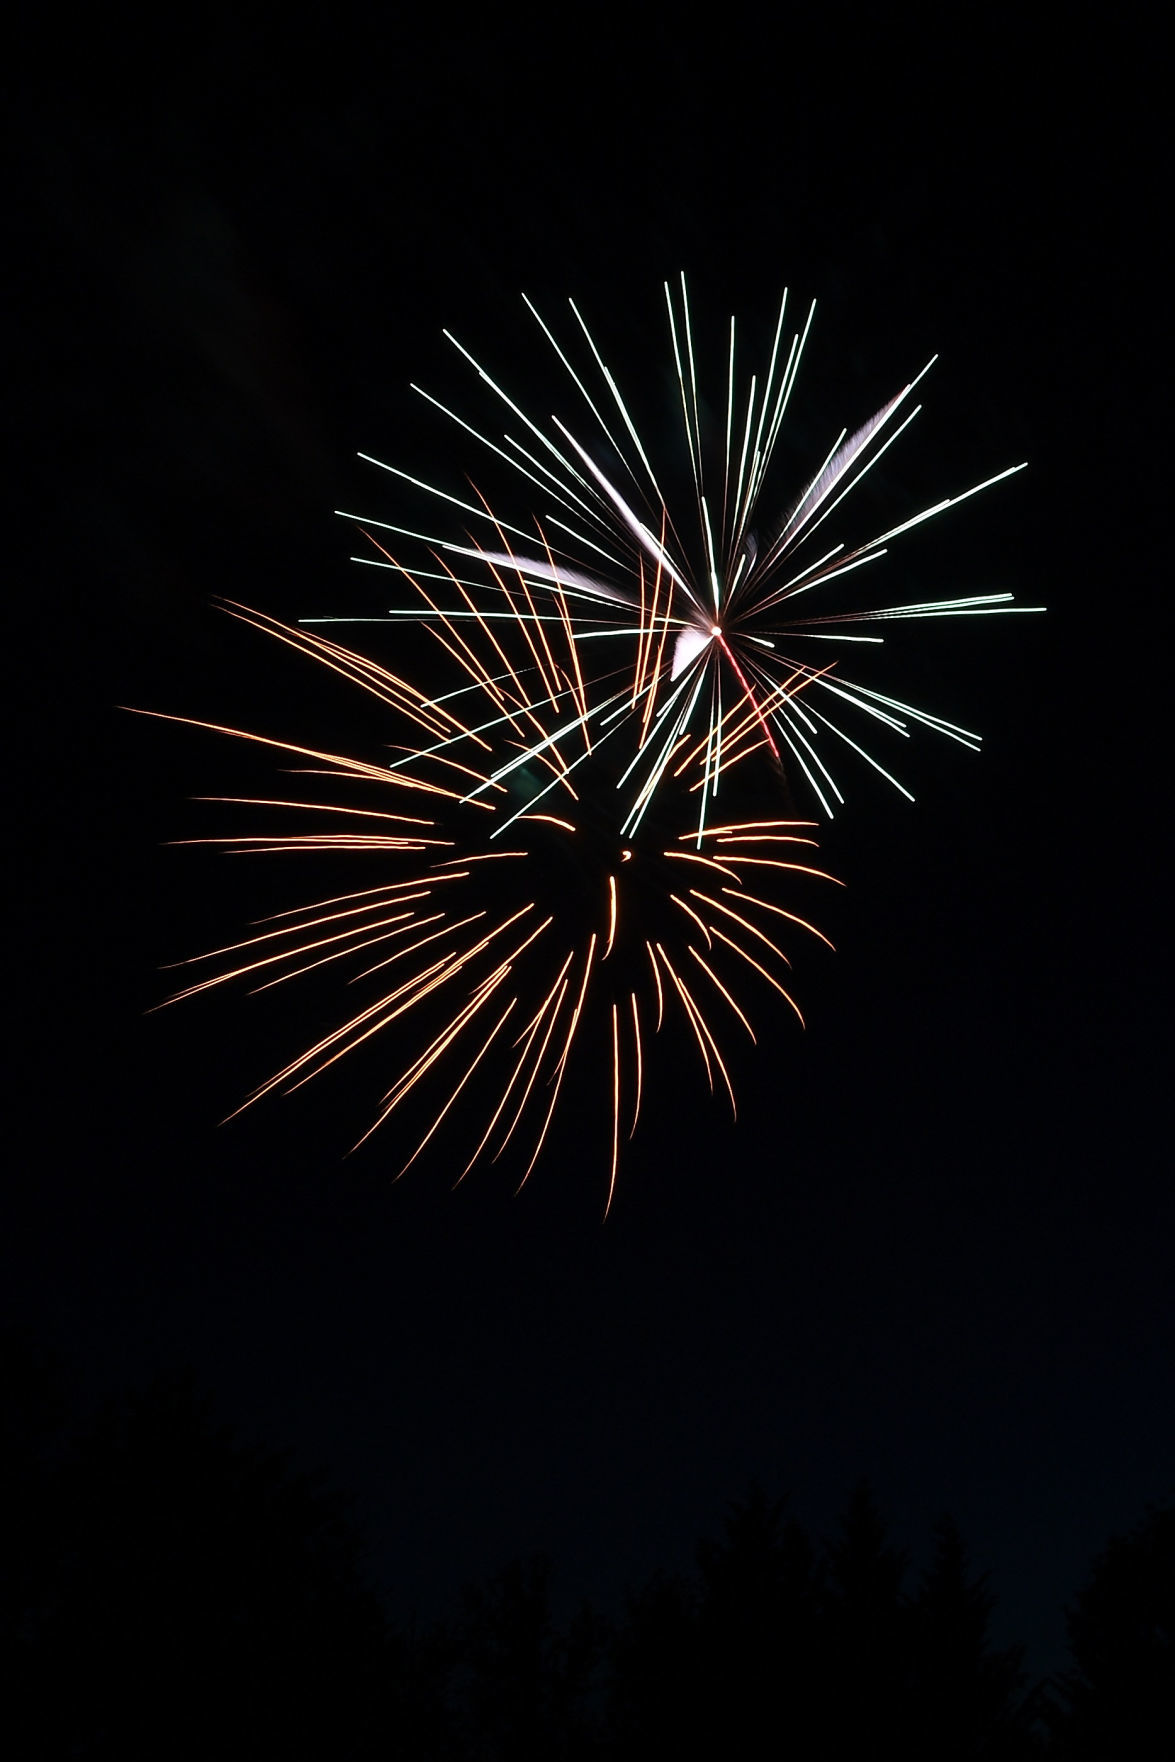 071020-pe-nws-philomath frolic fireworks gallery-LN42.JPG